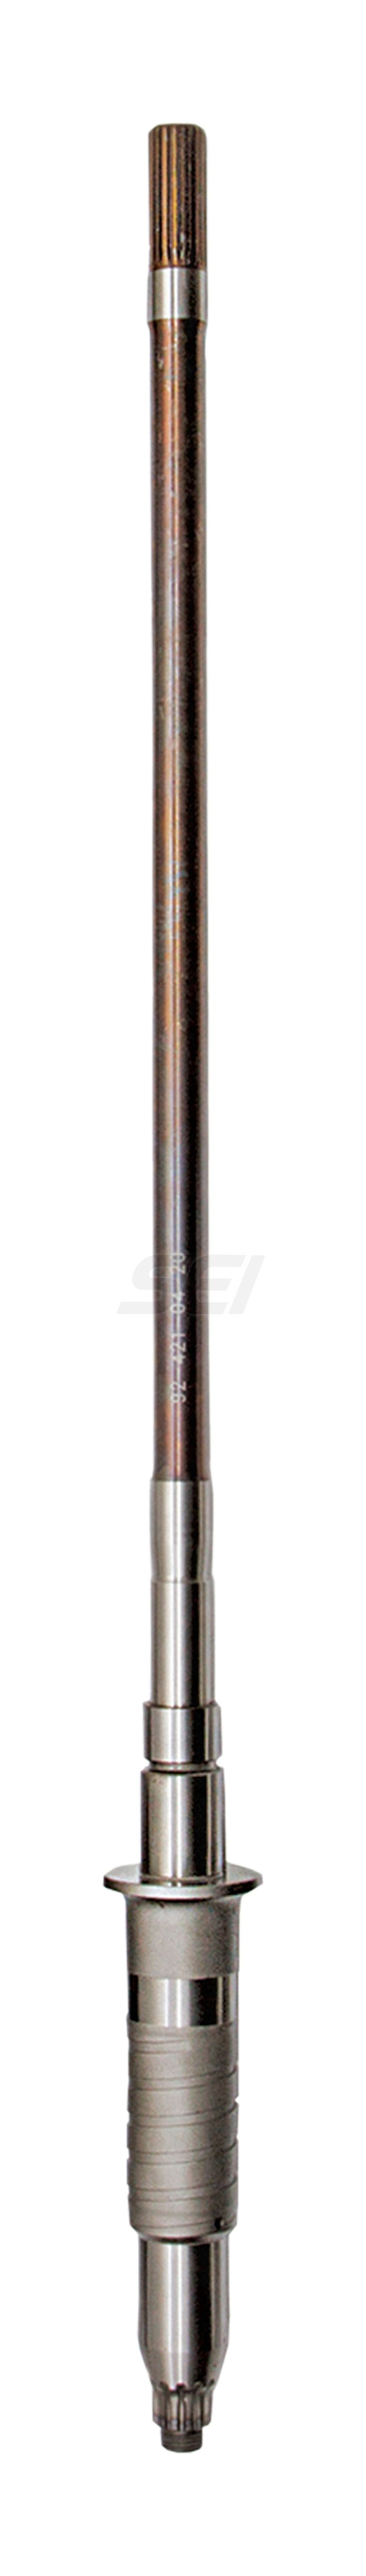 SEI YAMAHA Drive Shaft 66K-45501-00-00 - https://www.boatpartsforless.com/shop/sei-yamaha-drive-shaft-66k-45501-00-00/